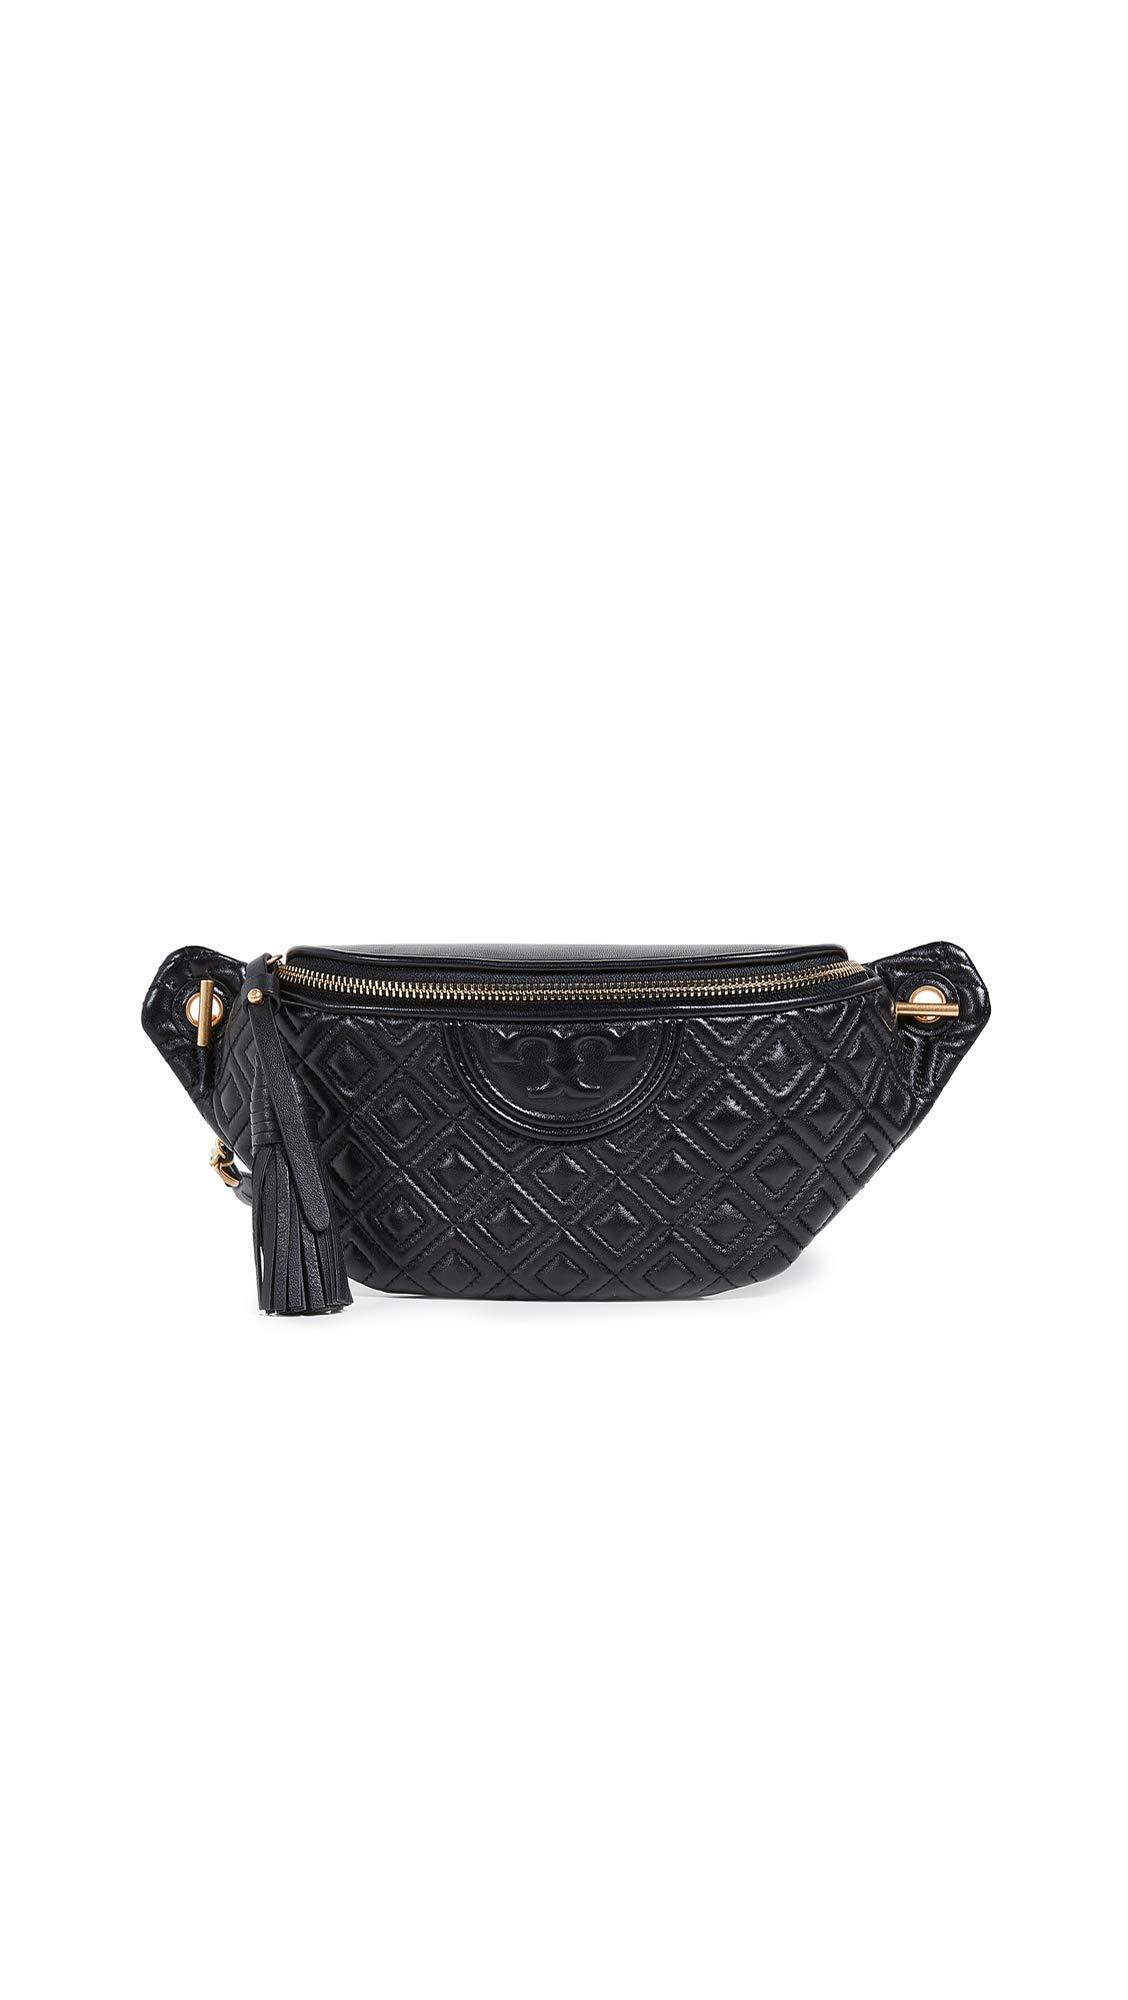 Tory Burch Women's Fleming Belt Bag, Black, One Size